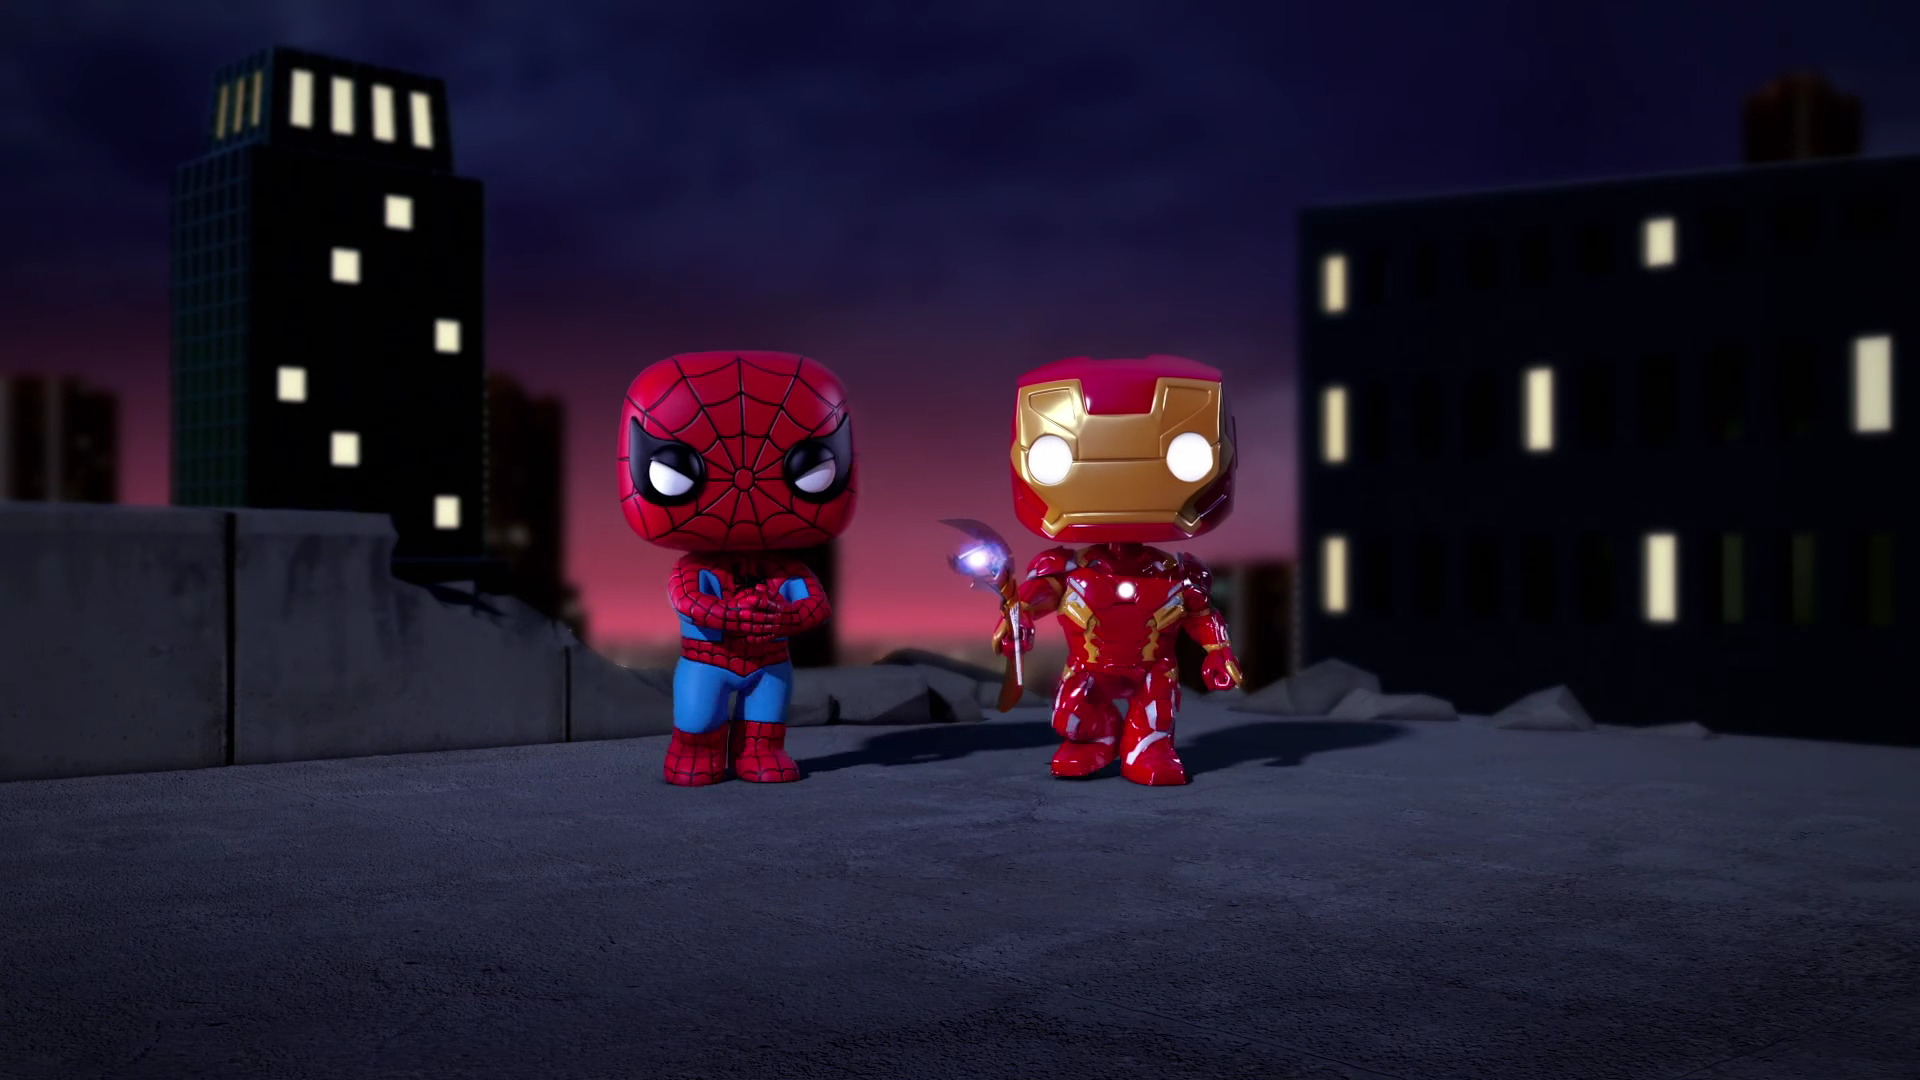 1920x1080 Iron Man And Spiderman Spellbound Animated Movie Laptop